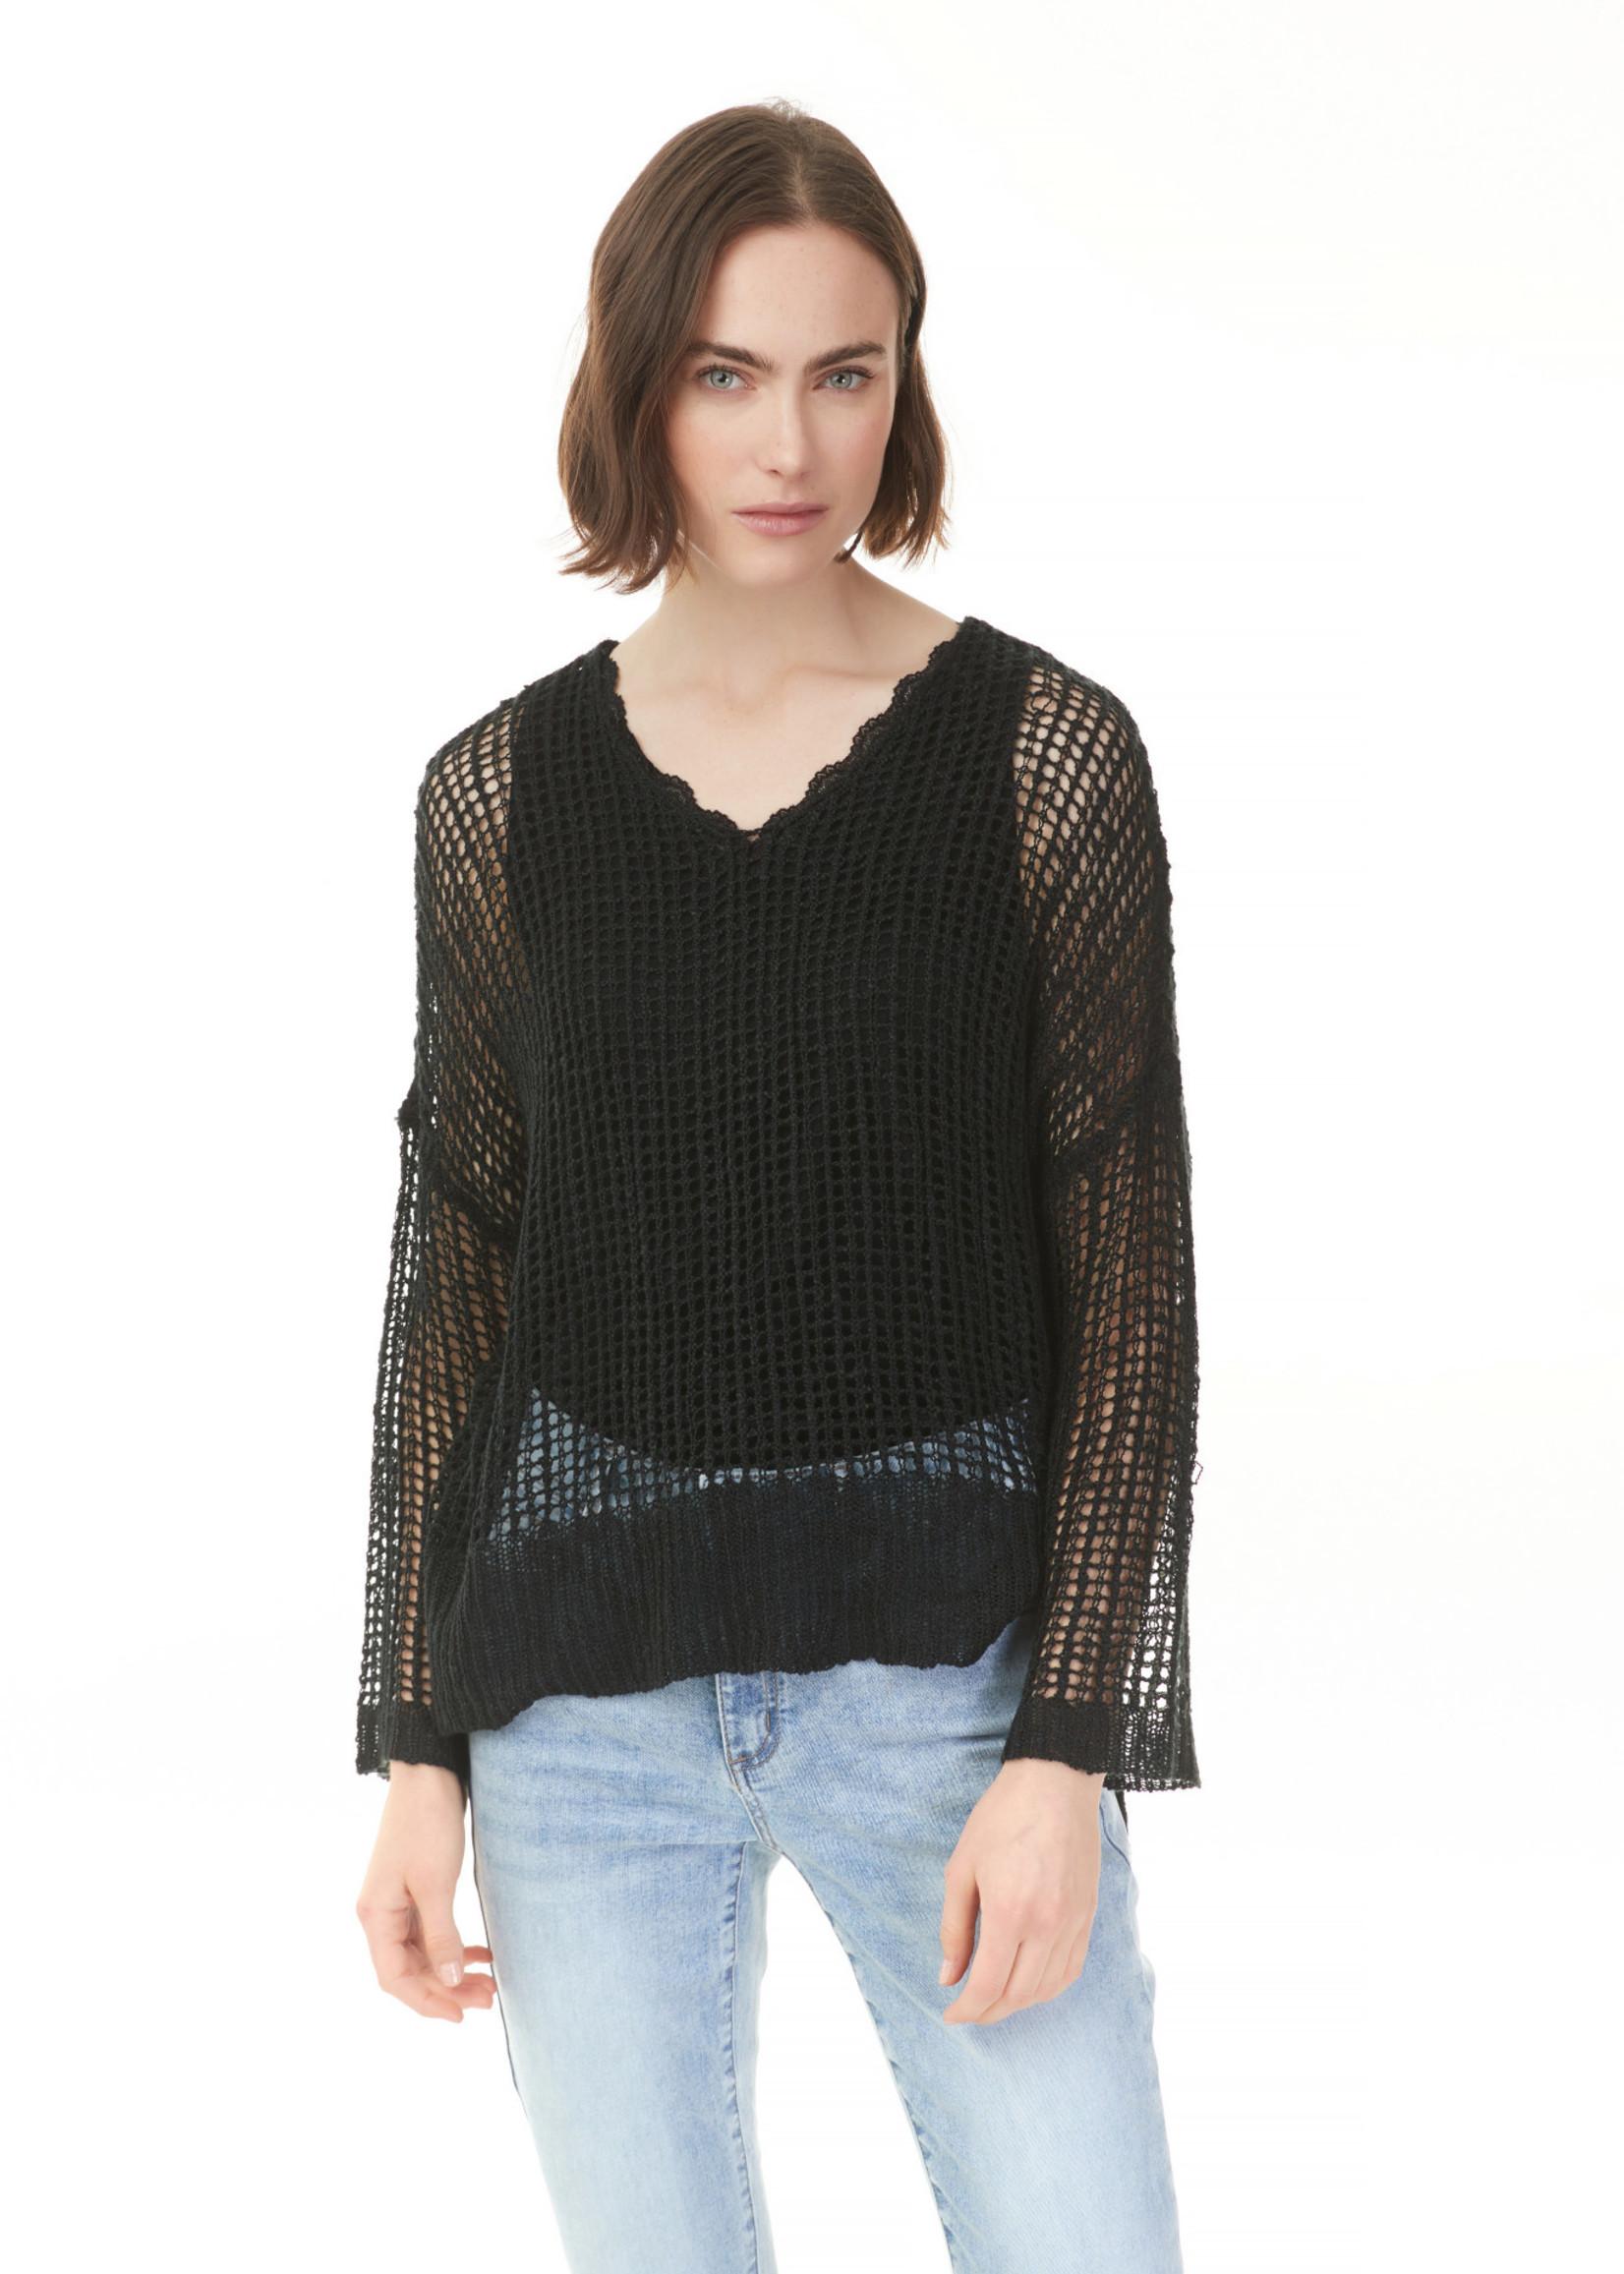 CharlieB C2326-029B Crochet